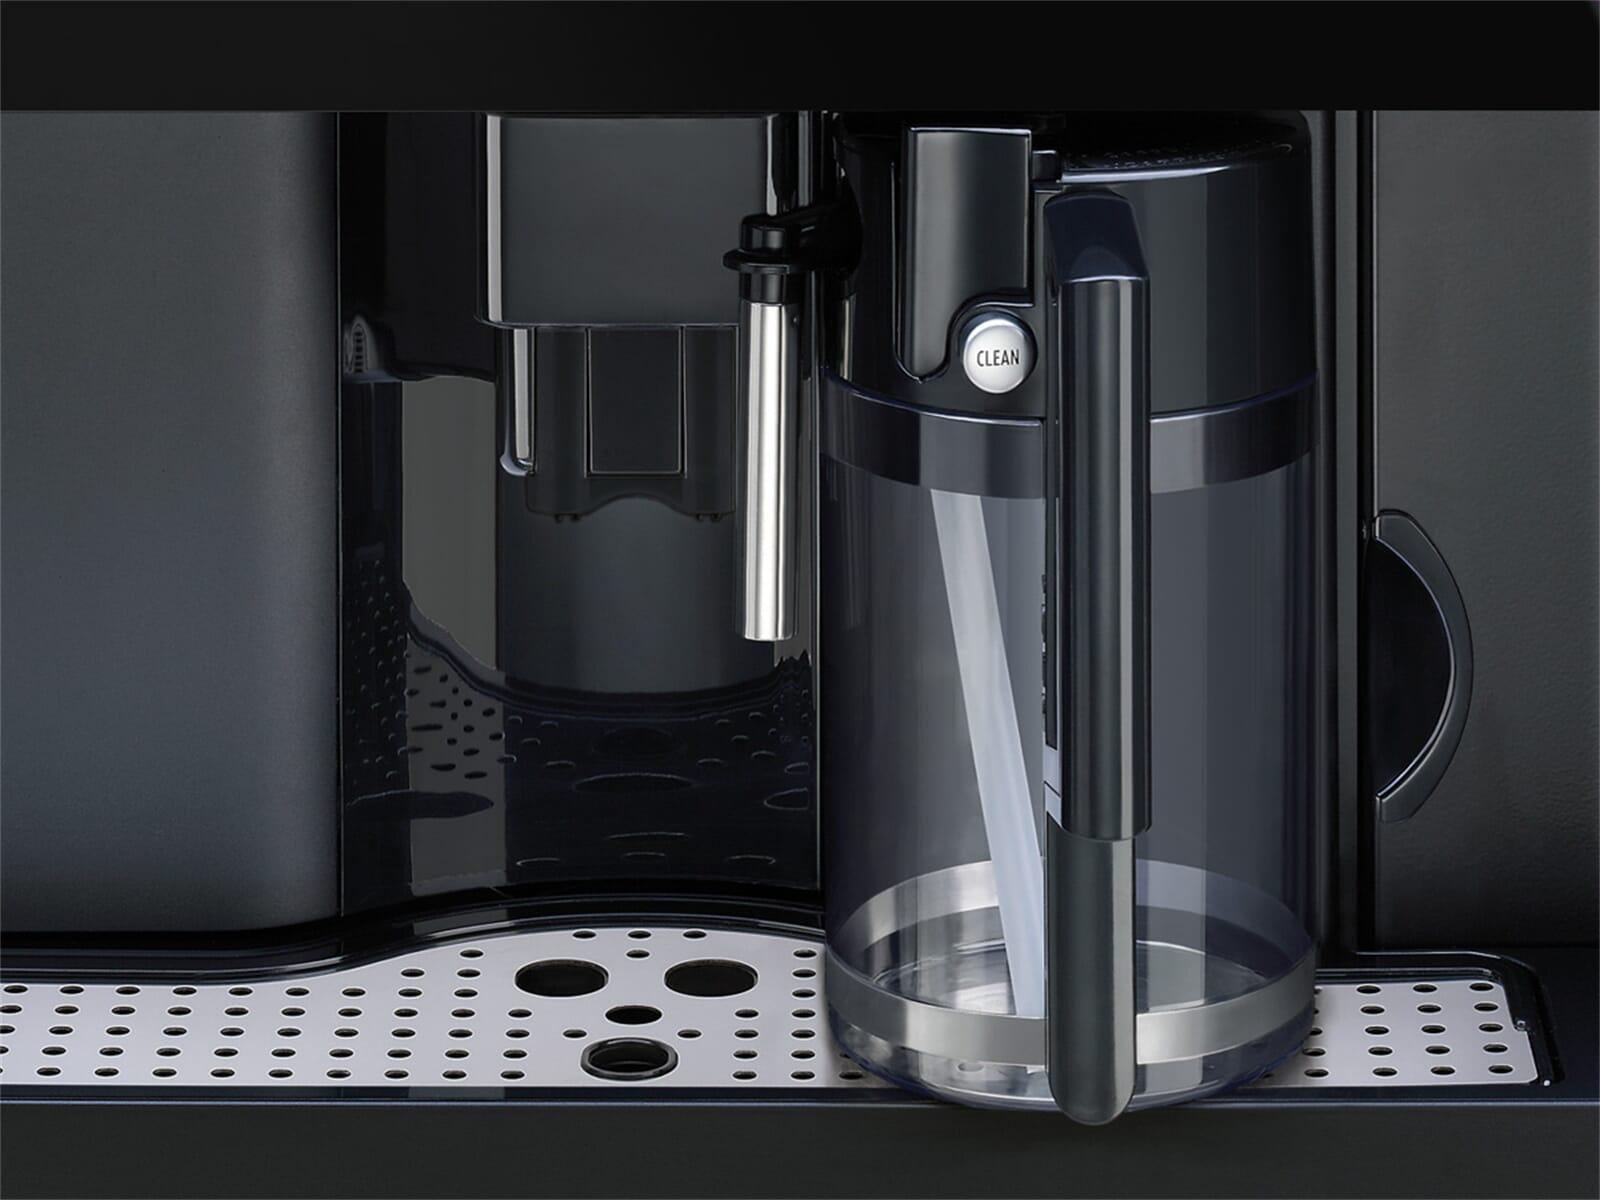 Gorenje Kühlschrank Kupfer : Smeg cms4601nr einbau espresso kaffeevollautomat schwarzglas kupfer